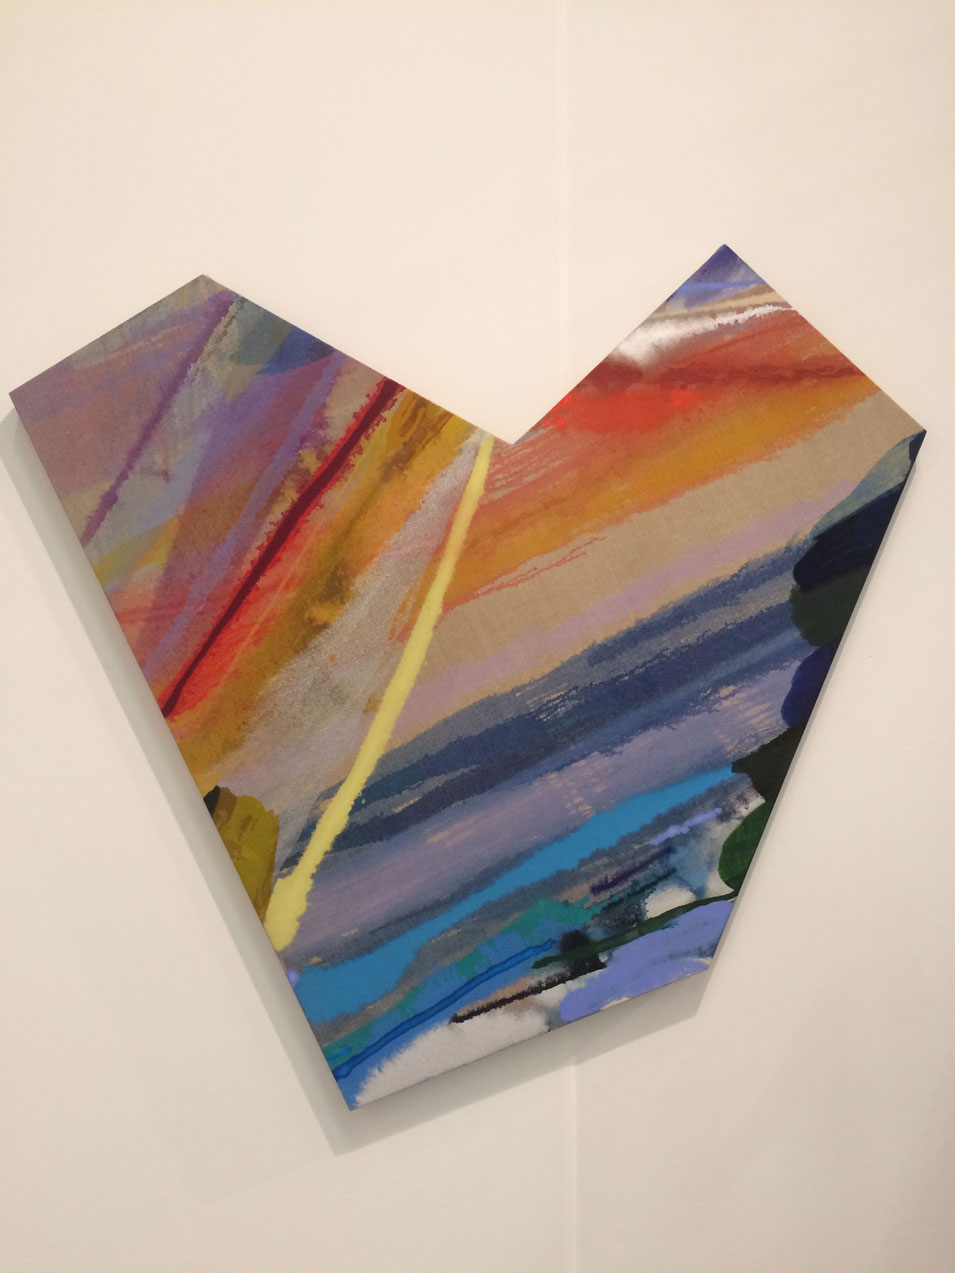 Pamela Jordan,  untitled , 2016, oil on linen, Klaus Von Nichtssagend Gallery, New York, NY